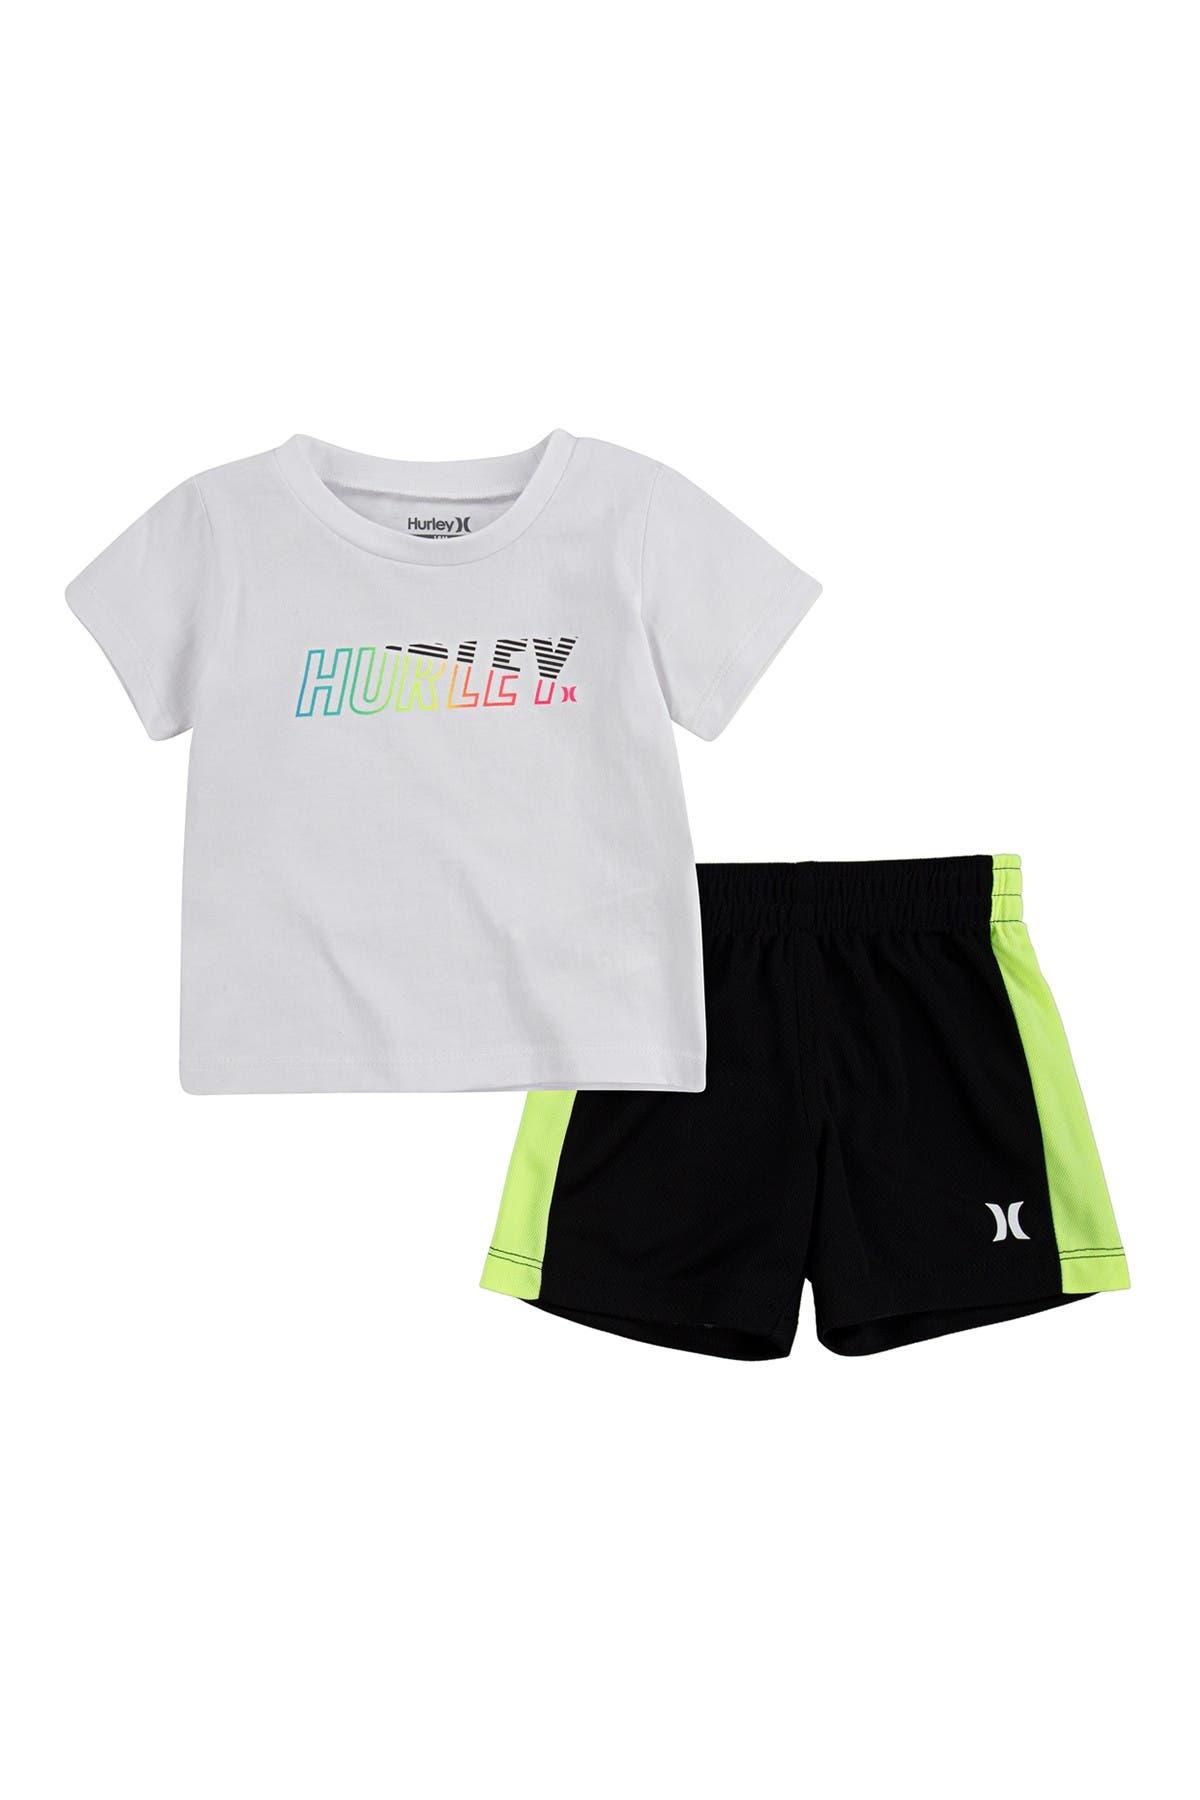 Image of Hurley On Shore T-Shirt & Shorts Set